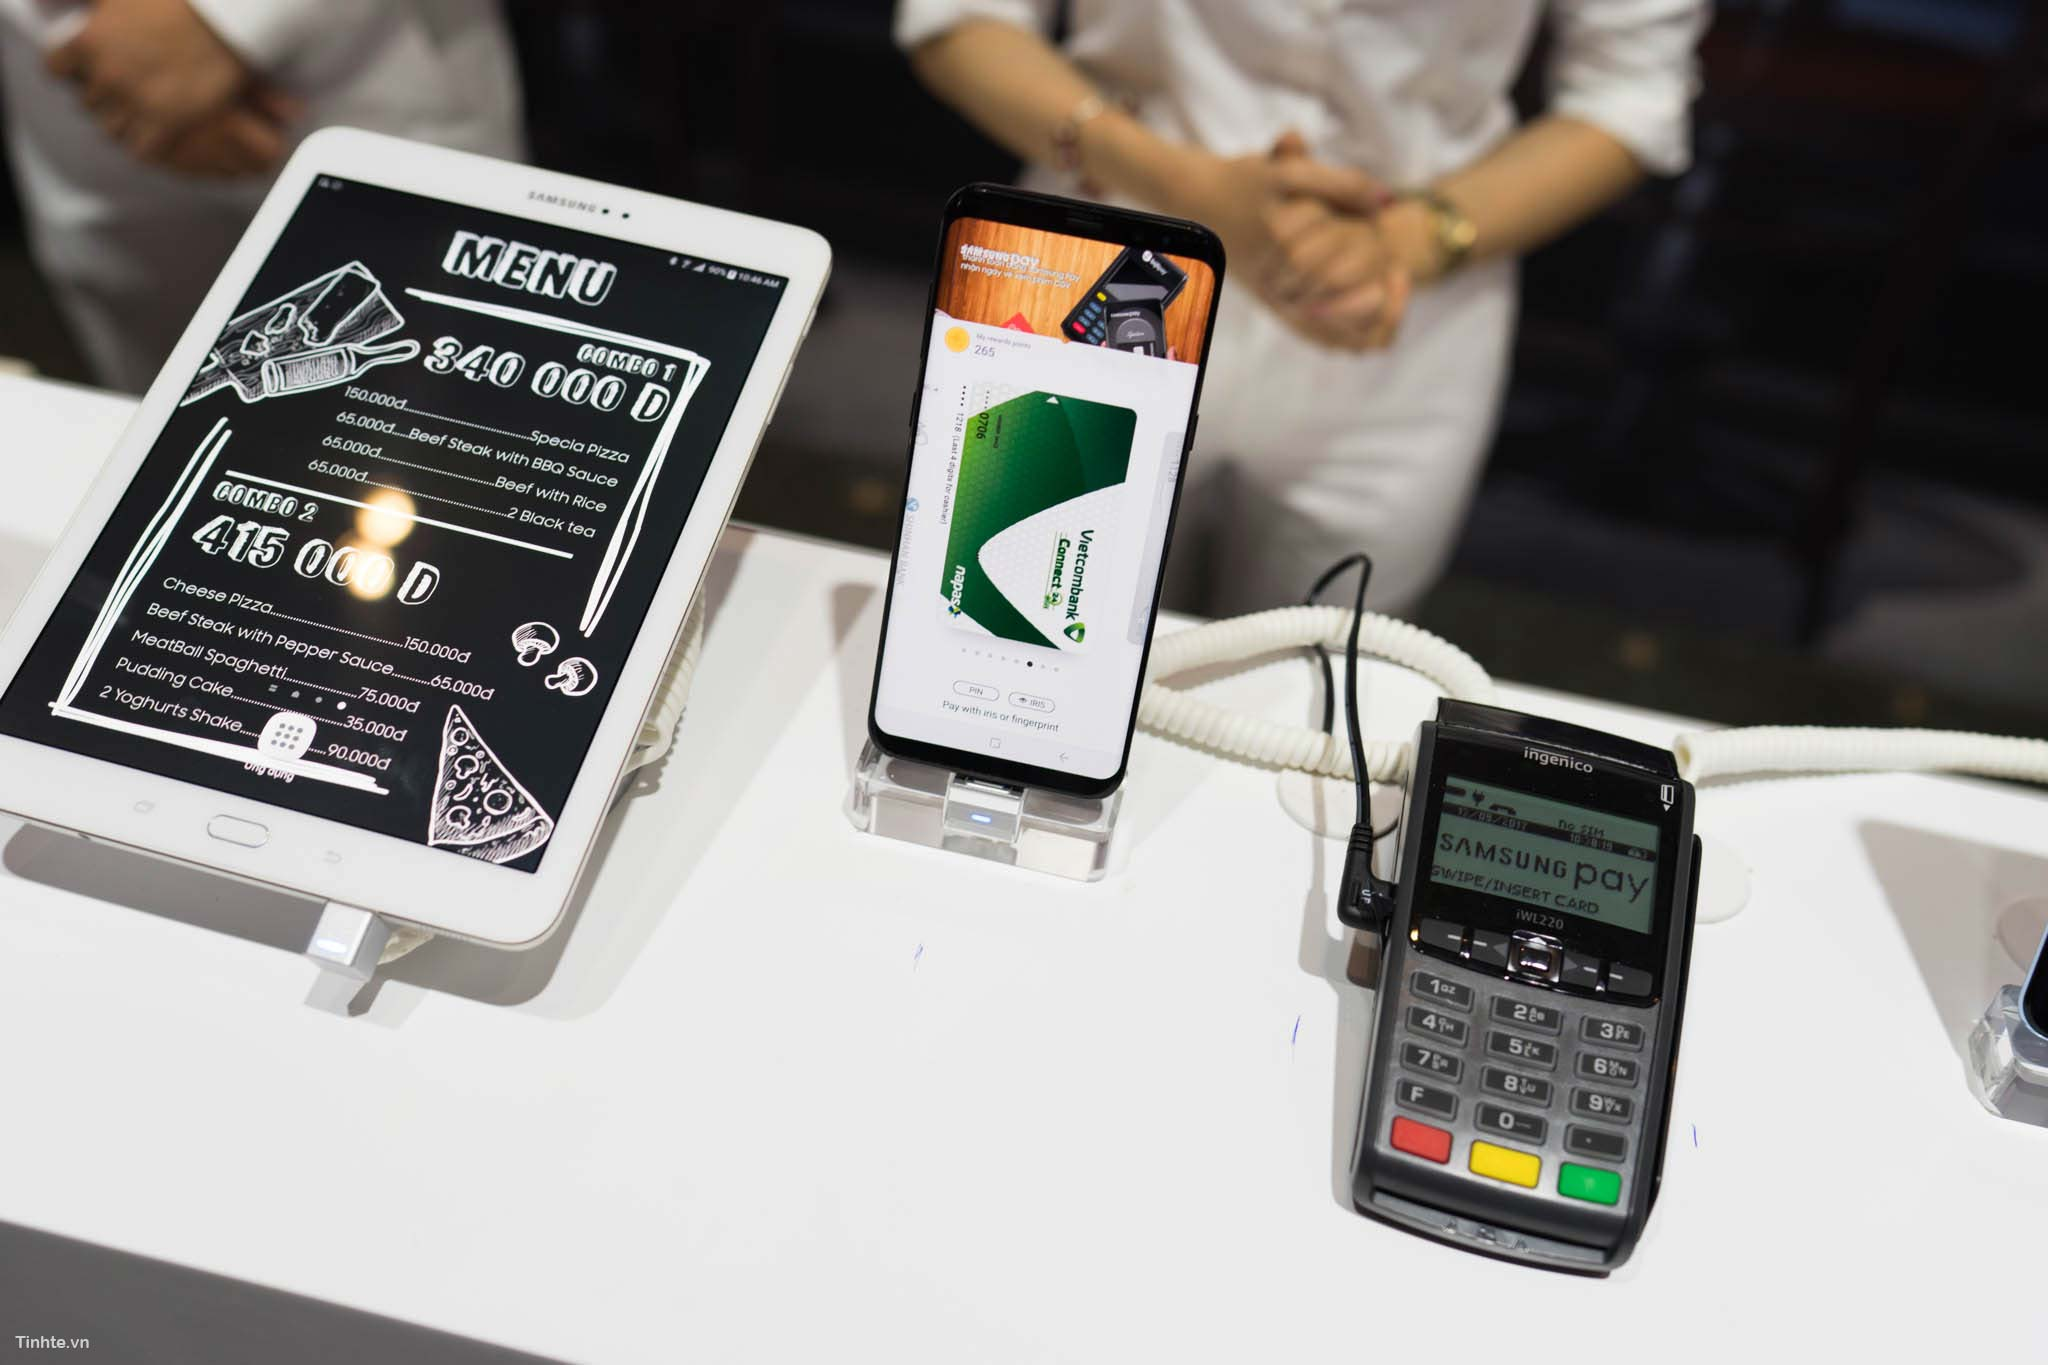 Samsung_pay-8.jpg